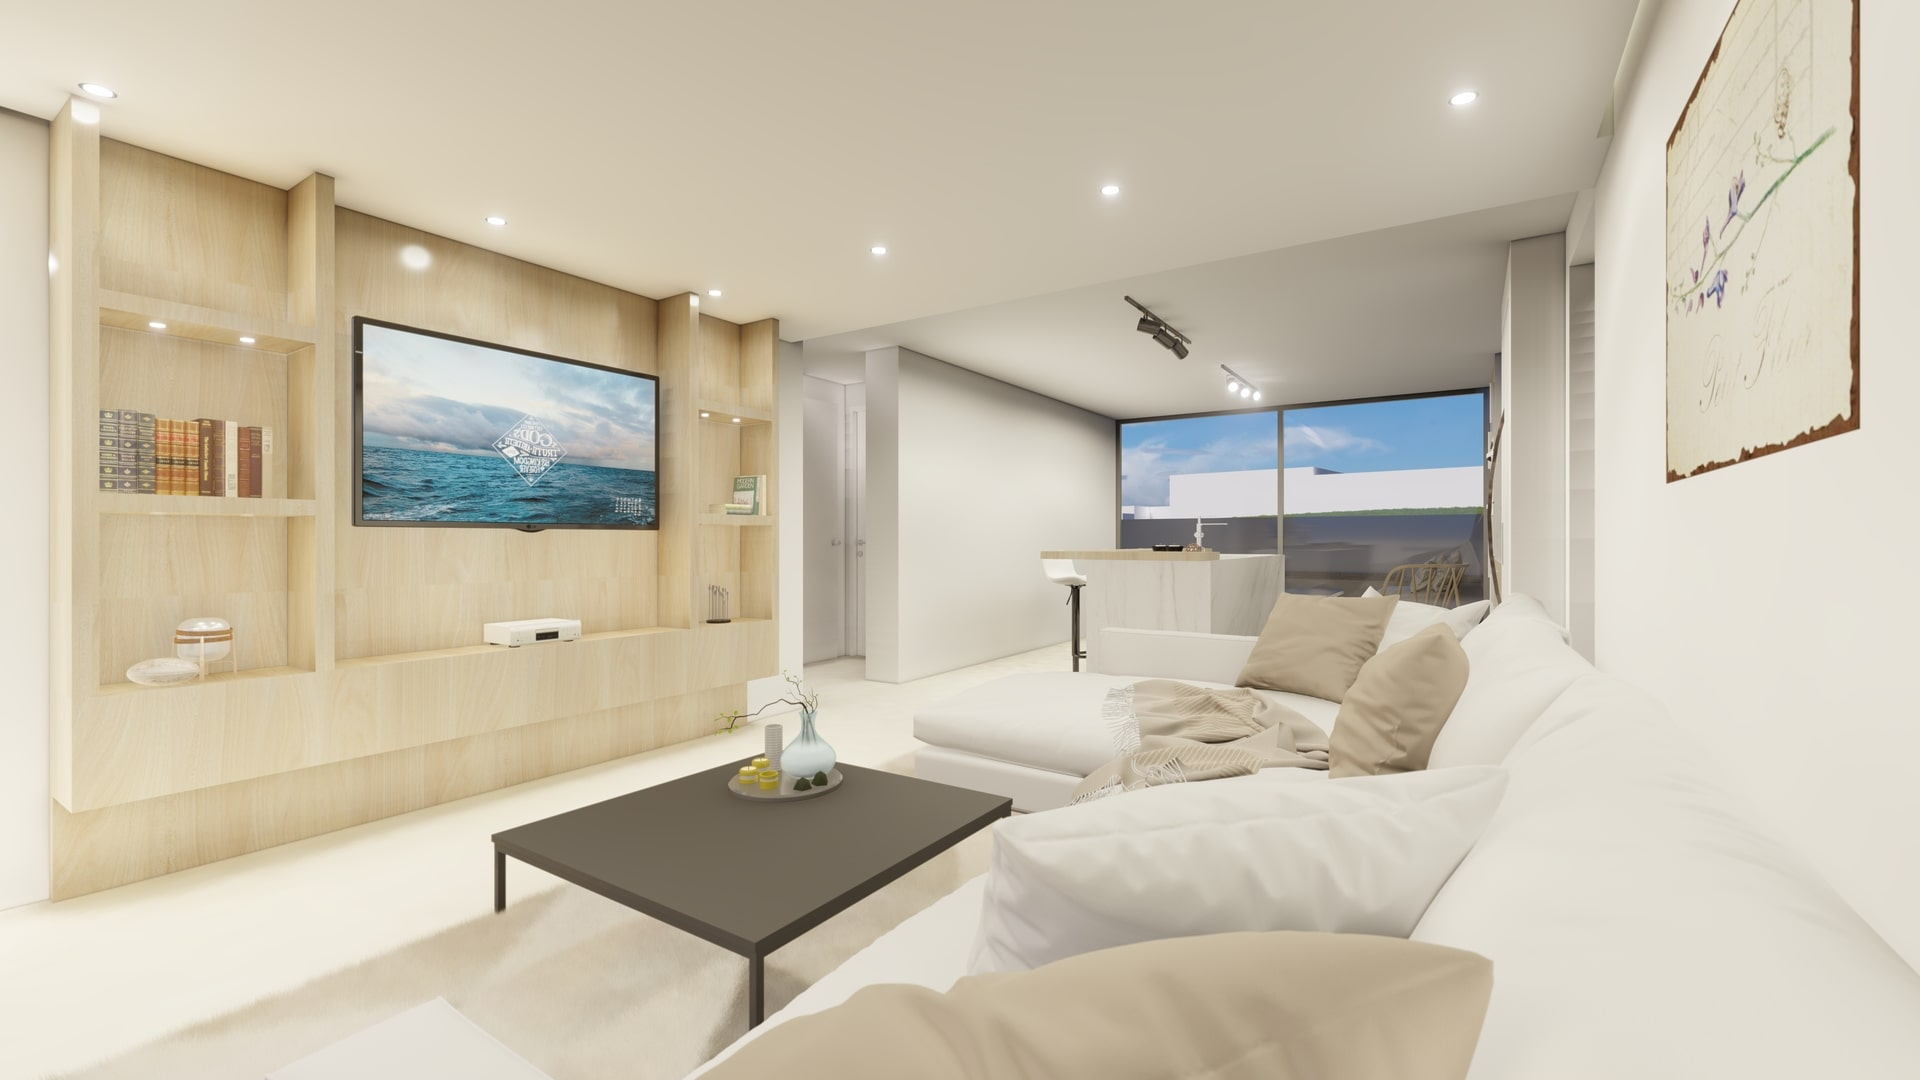 interior design of the luxury apartments in Limassol